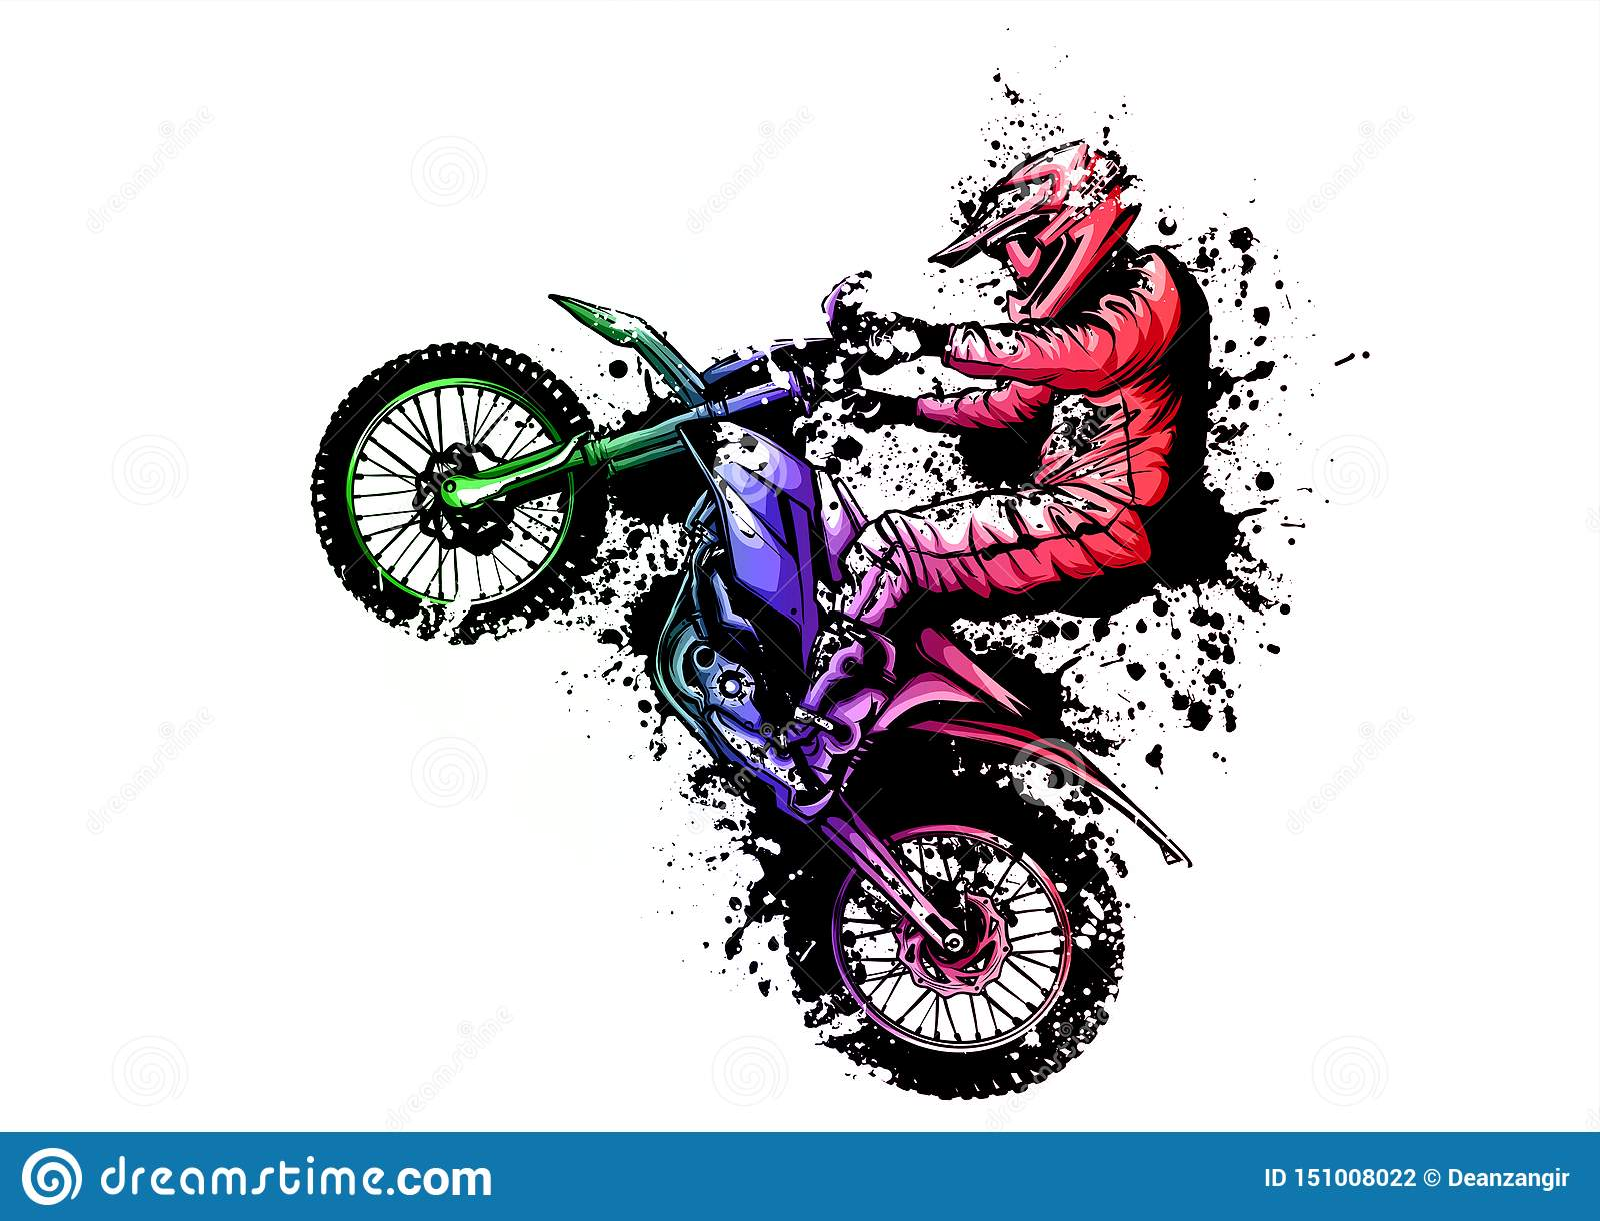 Bike Dirt Stock Illustrations 4 368 Bike Dirt Stock Illustrations Vectors Clipart Dreamstime